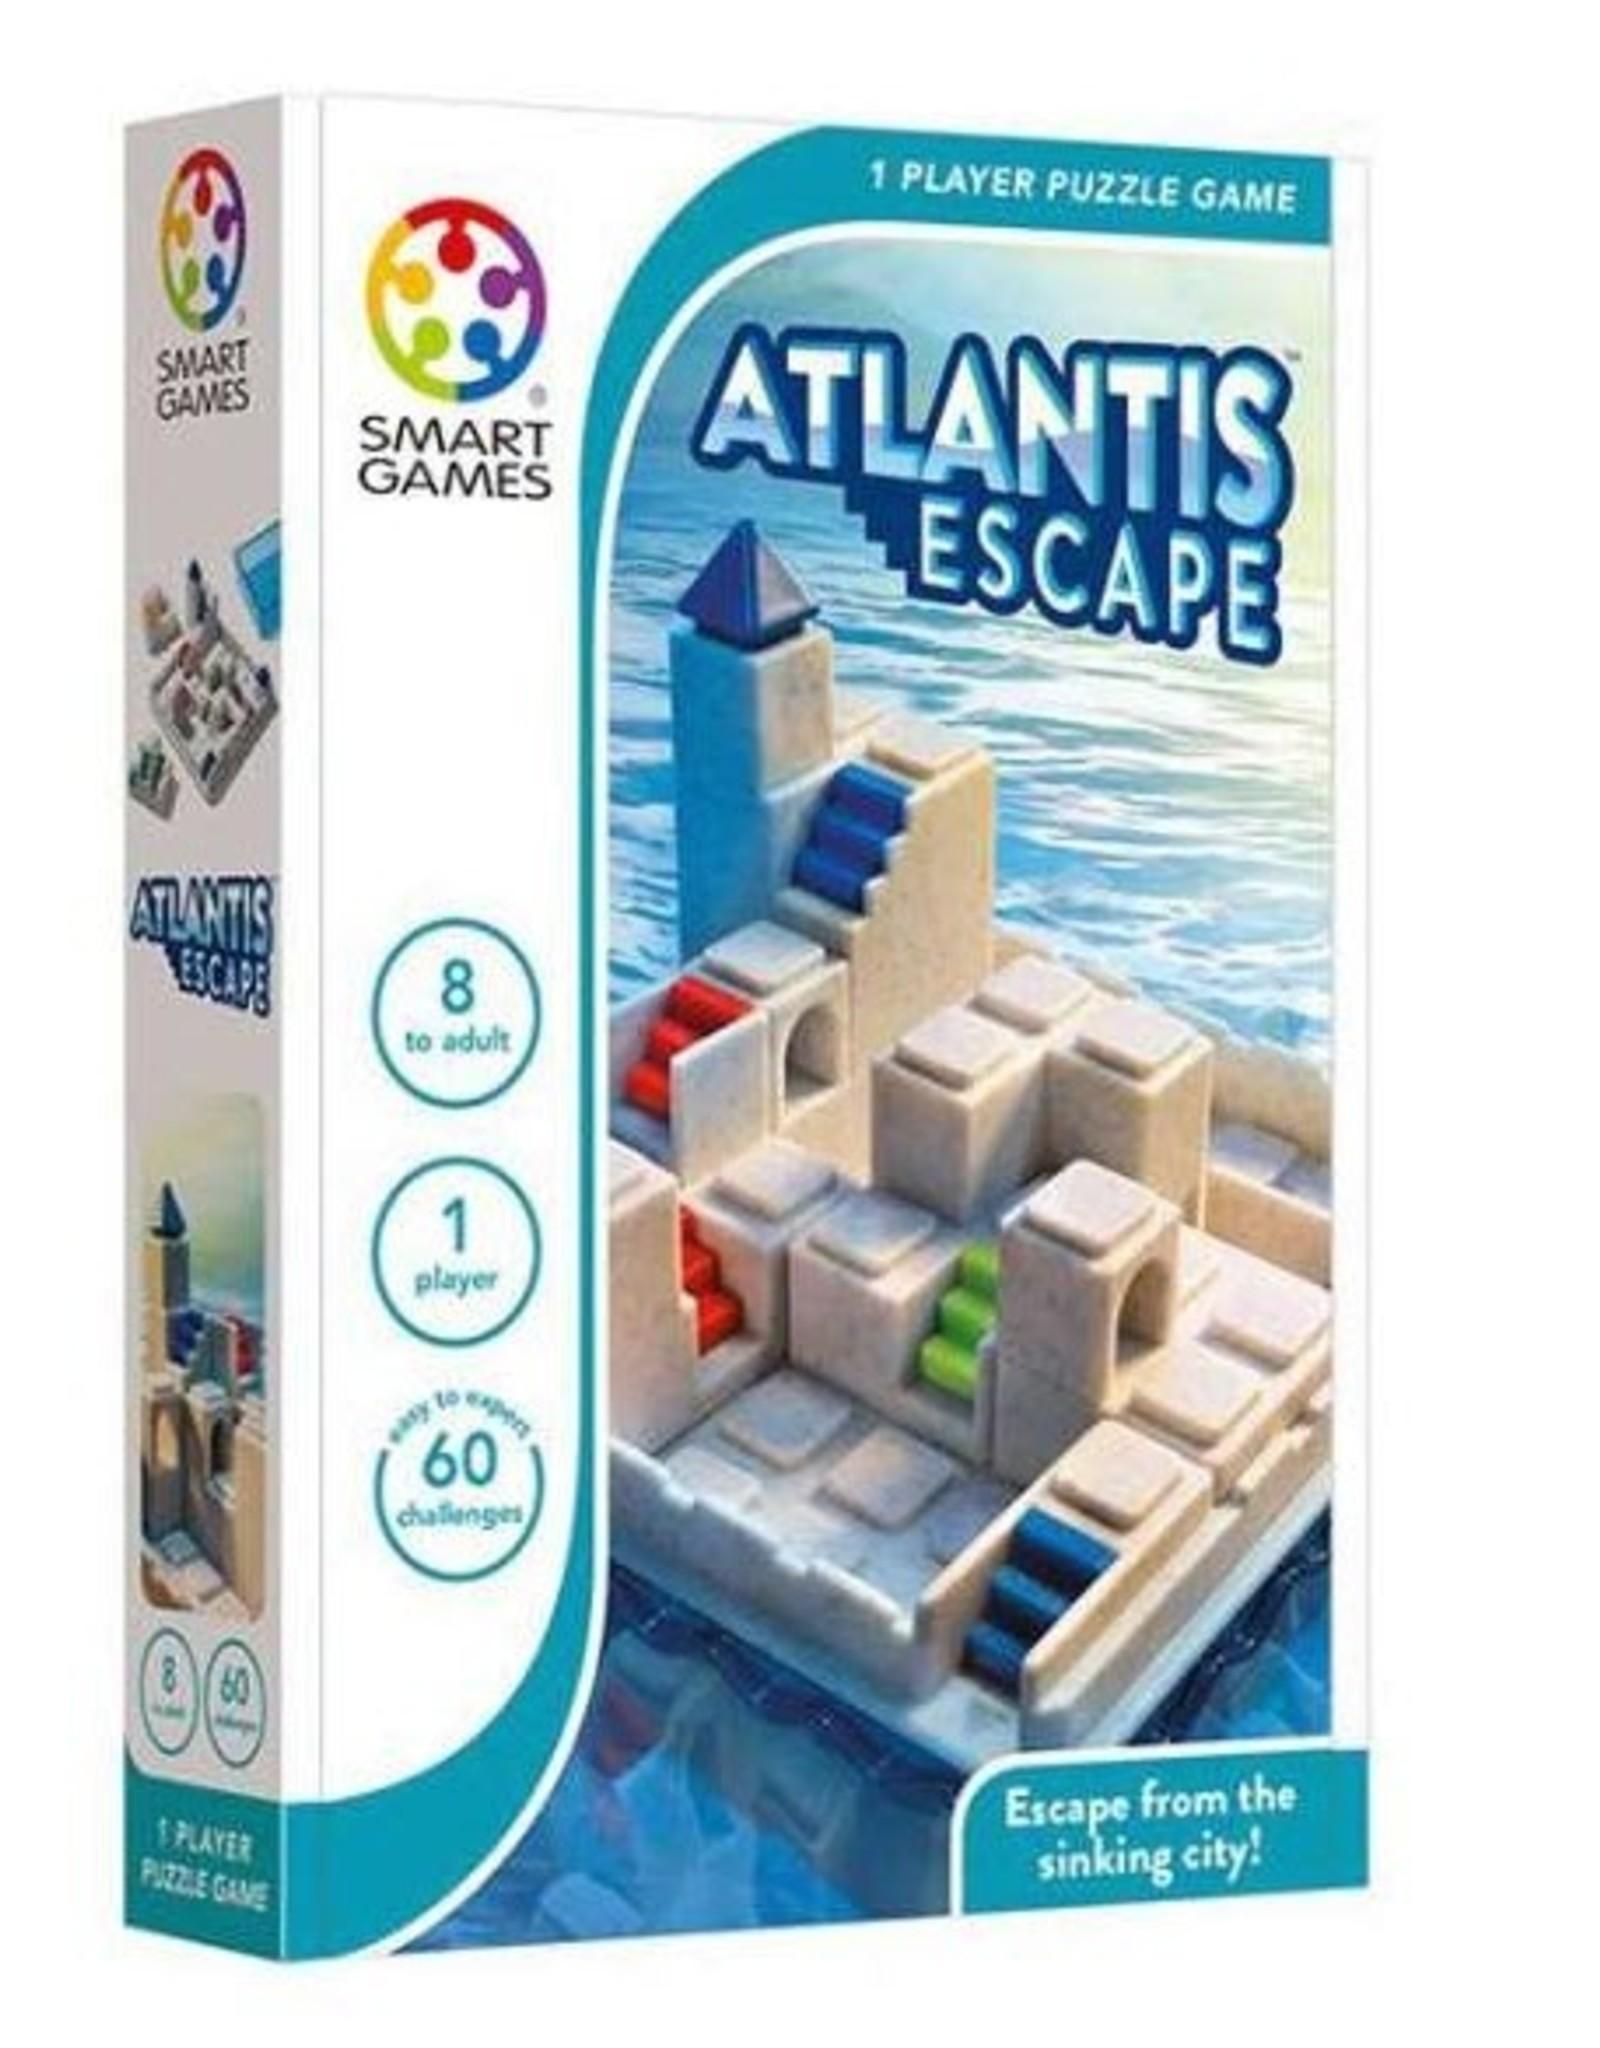 Smart Games Smart Games - Atlantis Escape